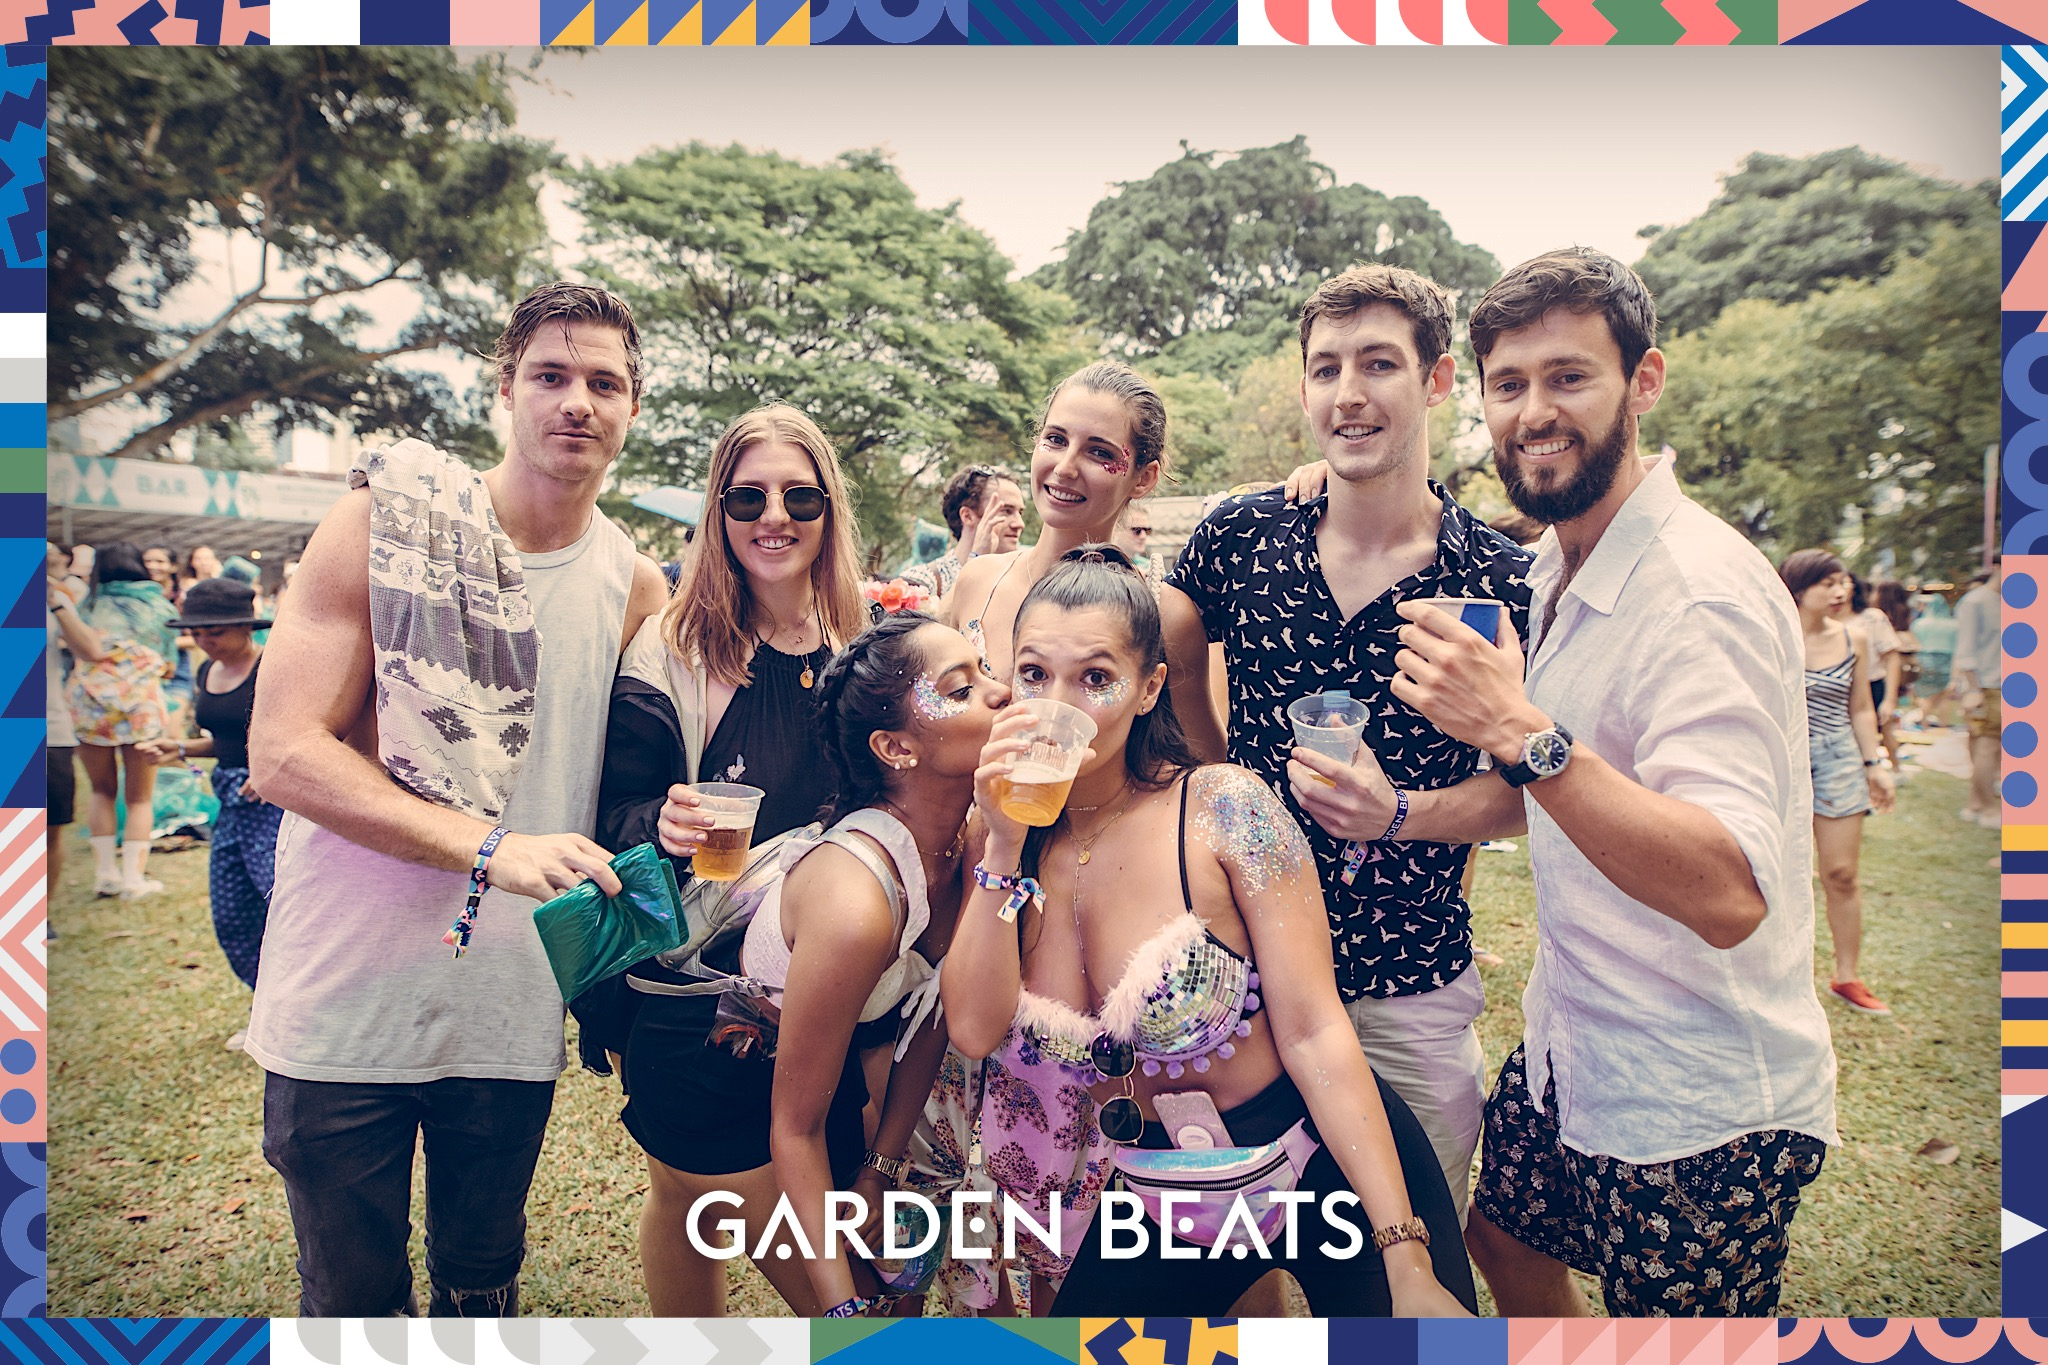 03032018_GardenBeats_Colossal549_Watermarked.jpg